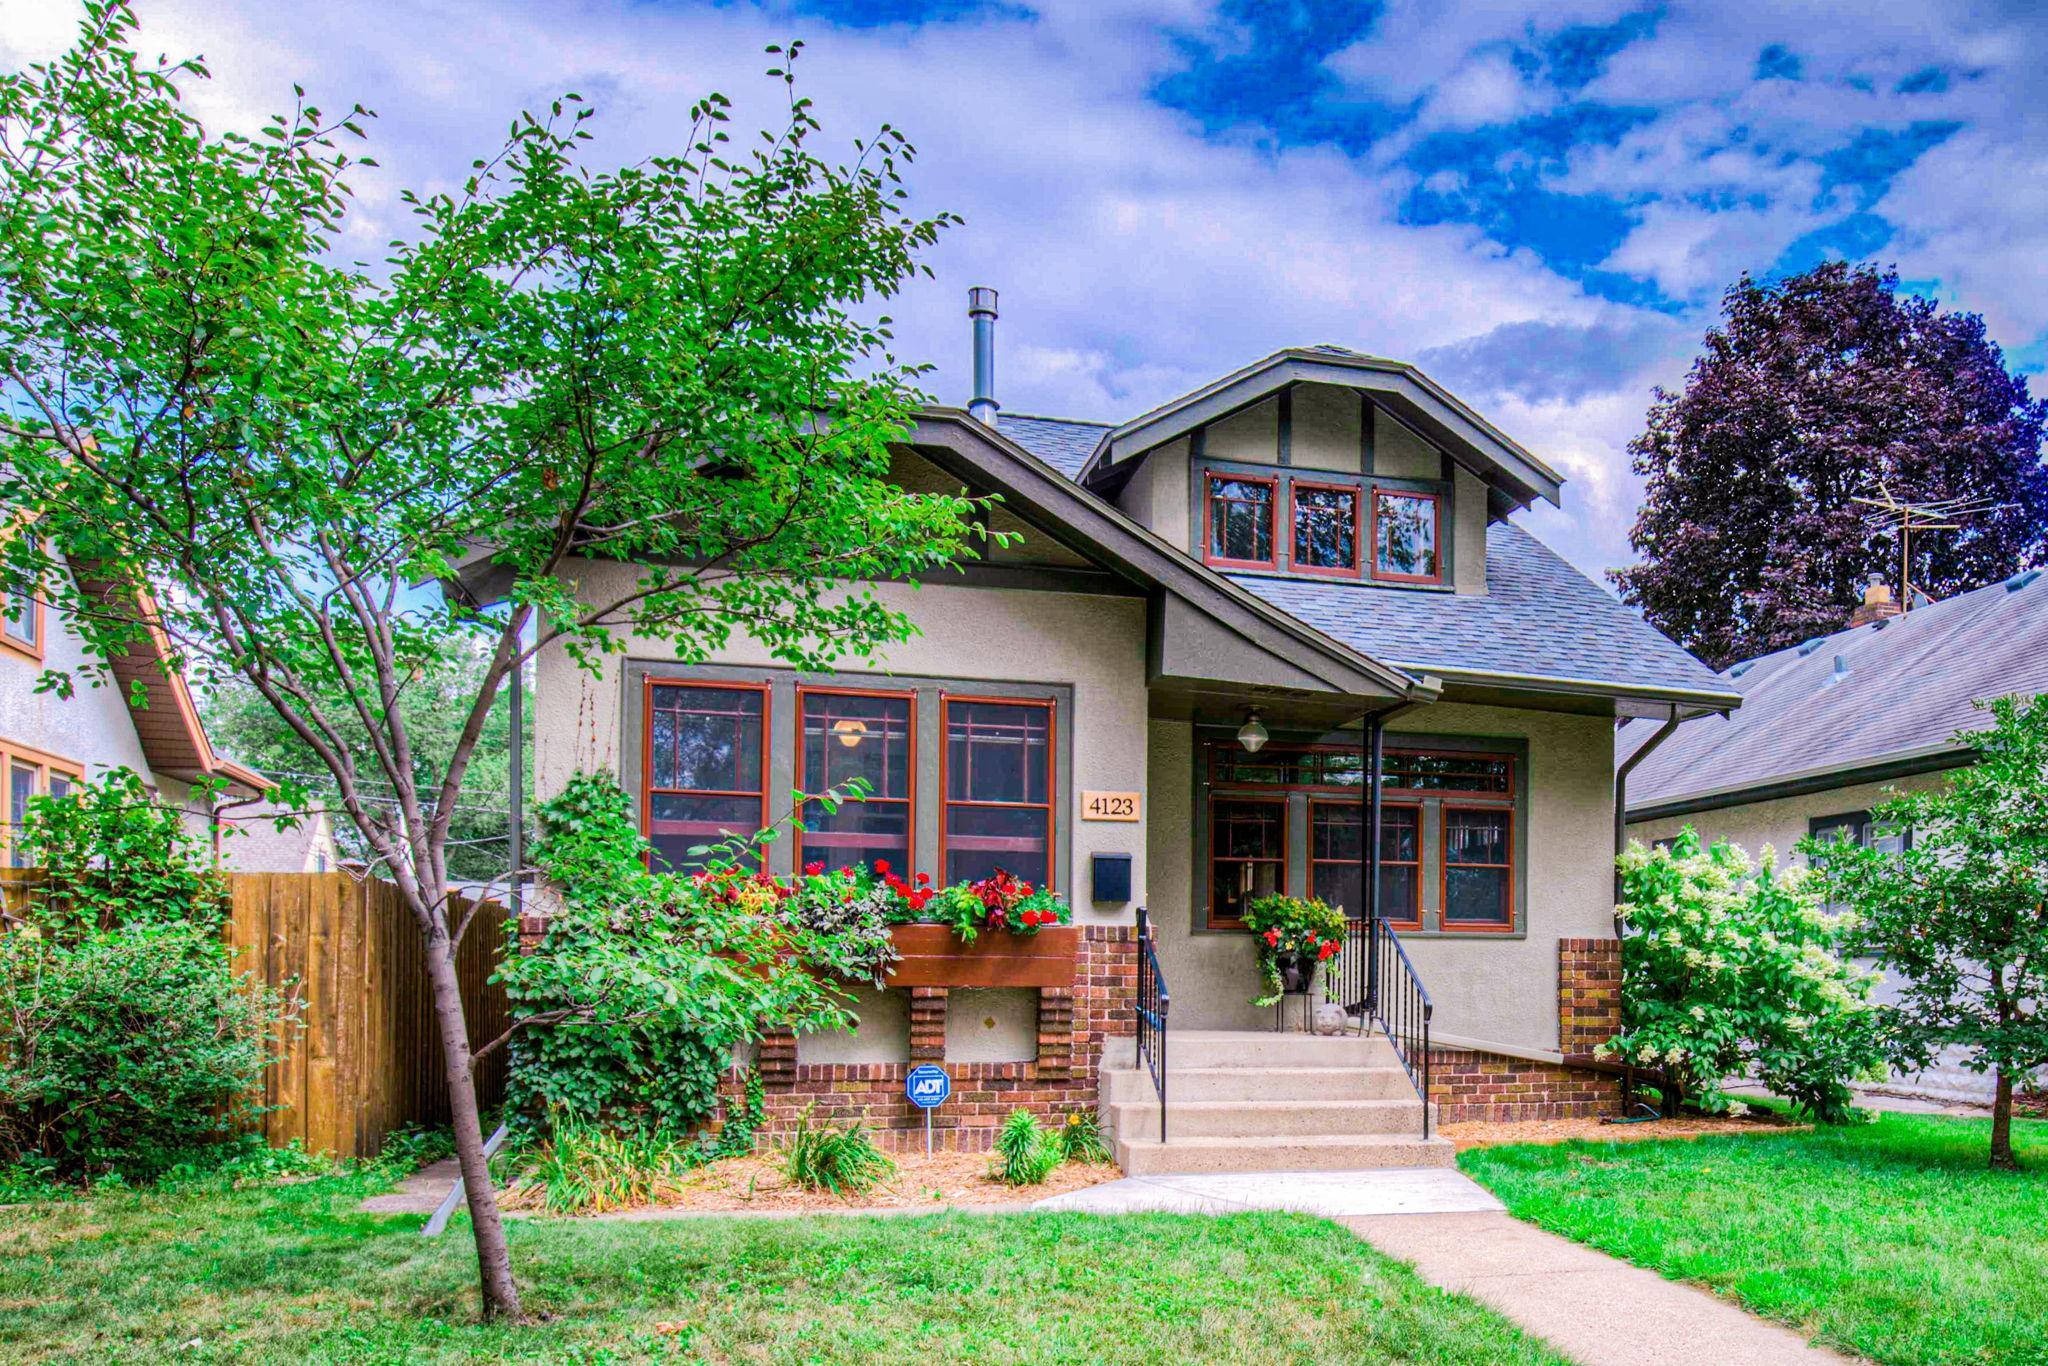 4123 18th Avenue S Property Photo - Minneapolis, MN real estate listing